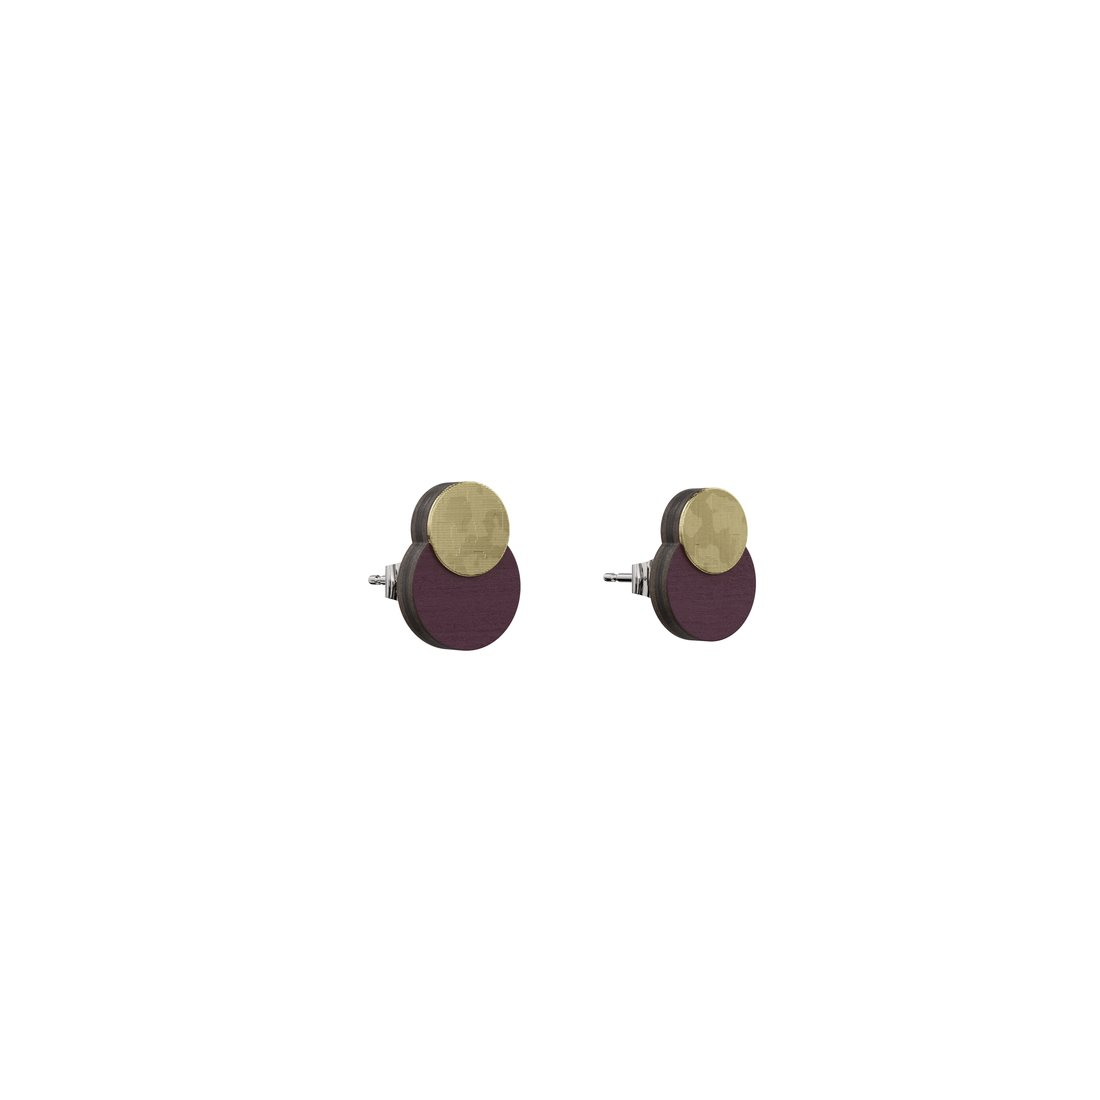 plum earrings